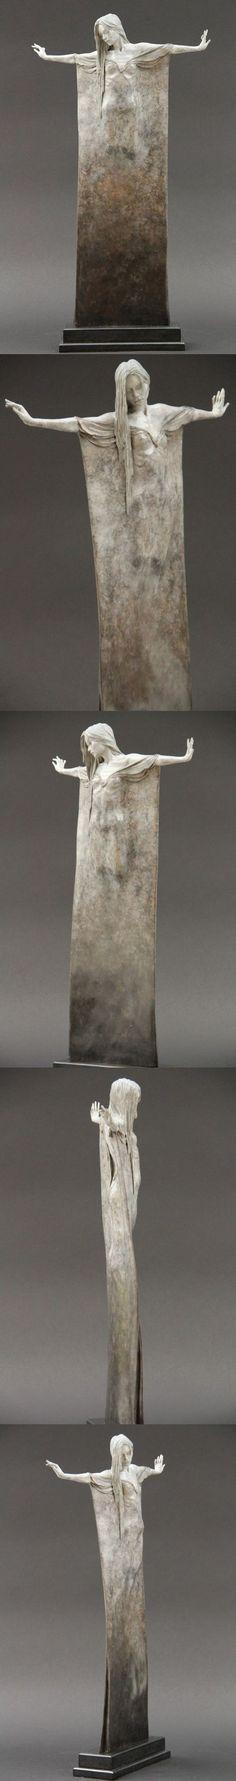 Art | アート | искусство | Arte | Kunst | Sculpture | 彫刻 | Skulptur | скульптура | Scultura | Escultura | Ophelia, Michael James Talbot